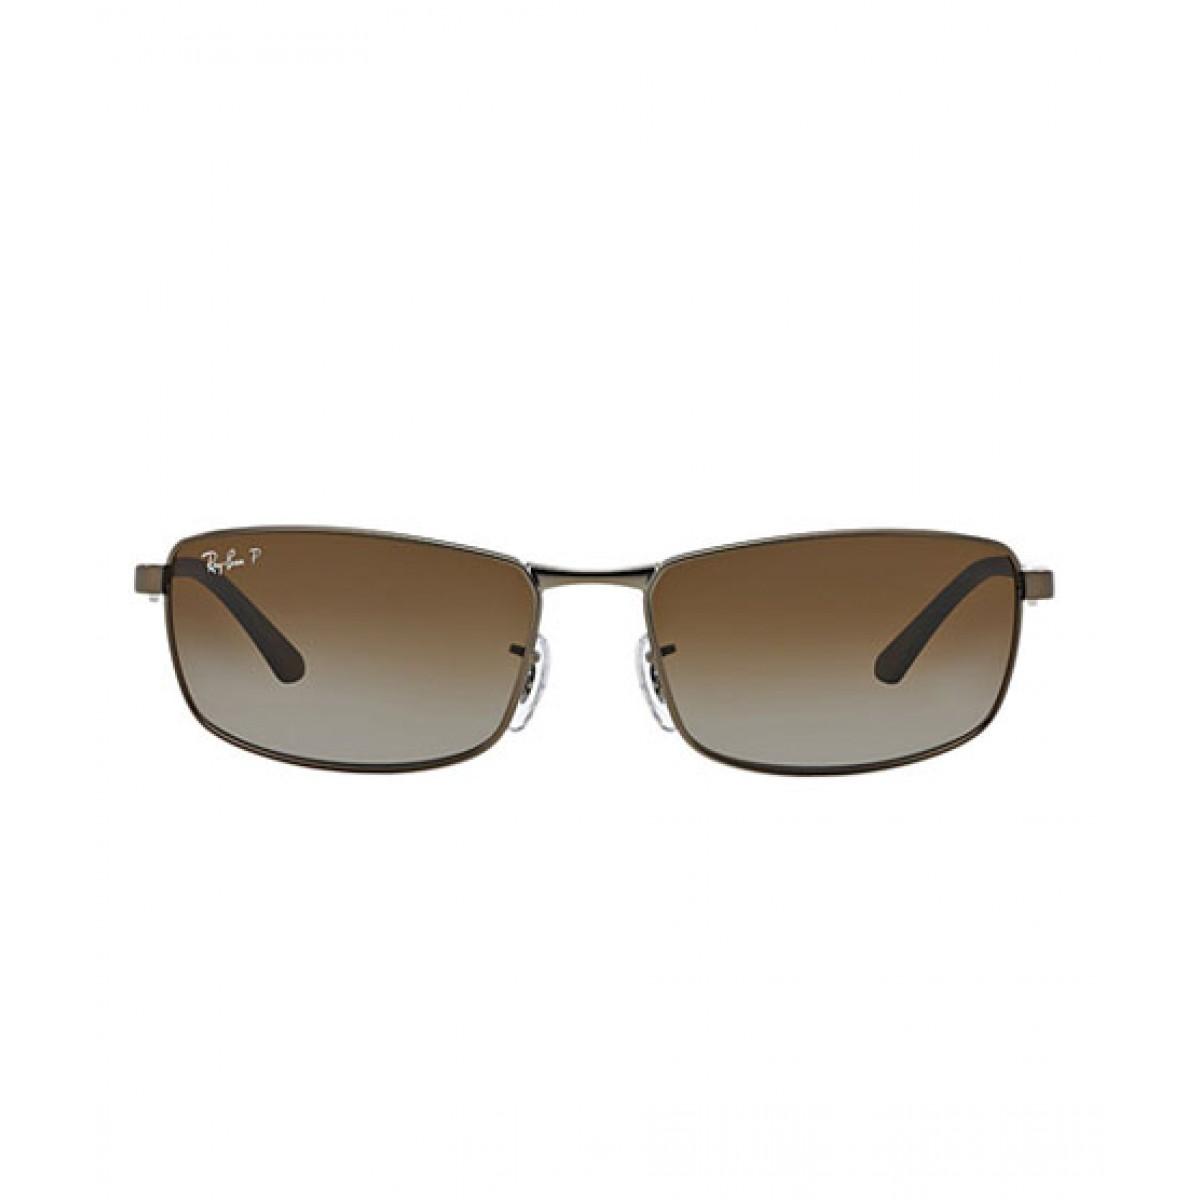 cc3db9673e9 RayBan Sunglasses Price in Pakistan